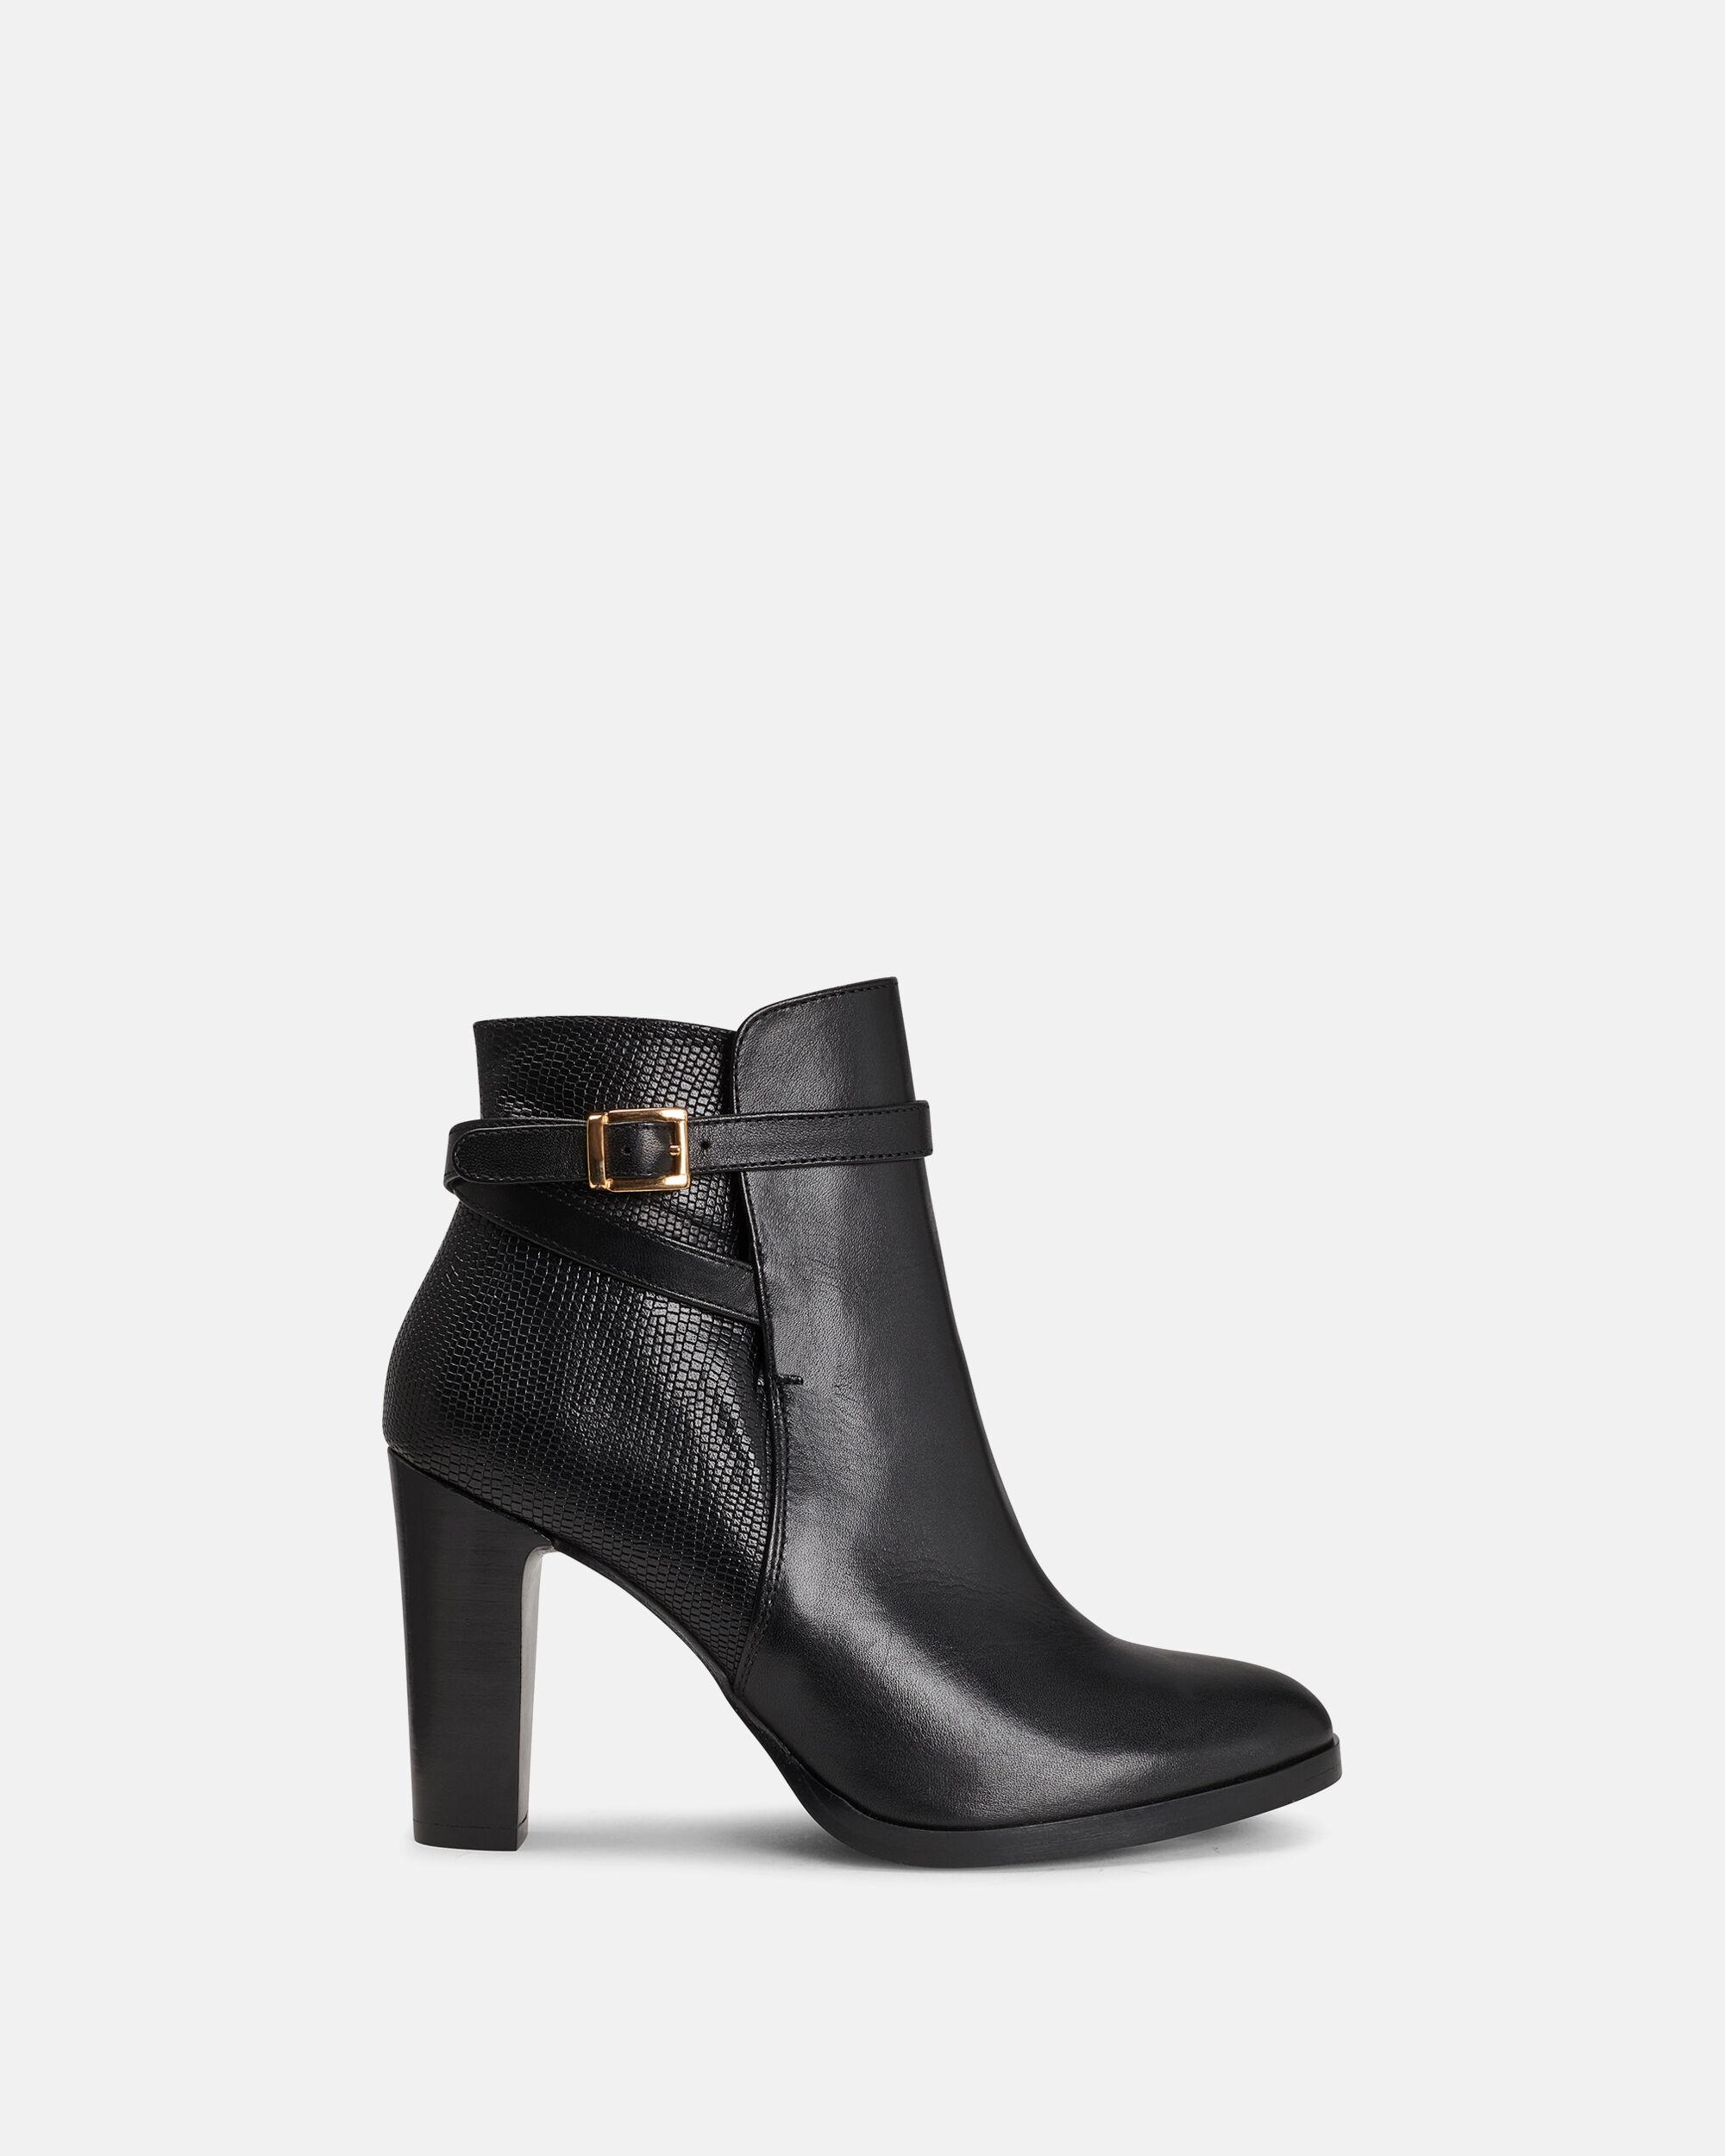 2019 France Femmes Sandals Sandals Tamaris Sandalette Mit